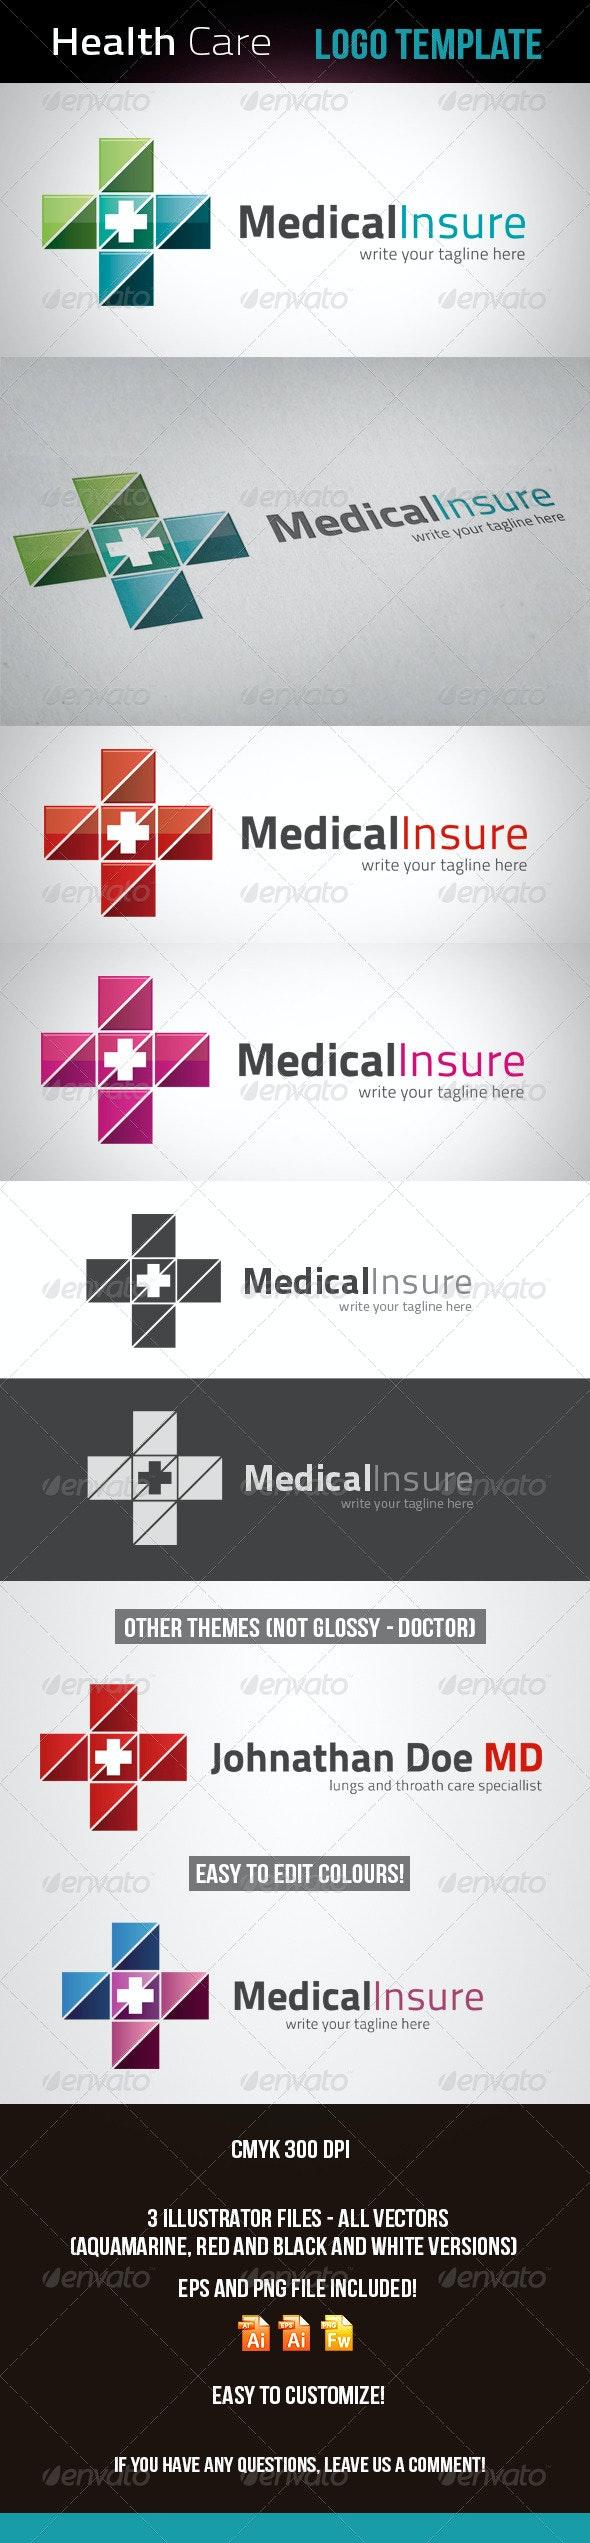 Doctor - Health Care Logo Template - Logo Templates